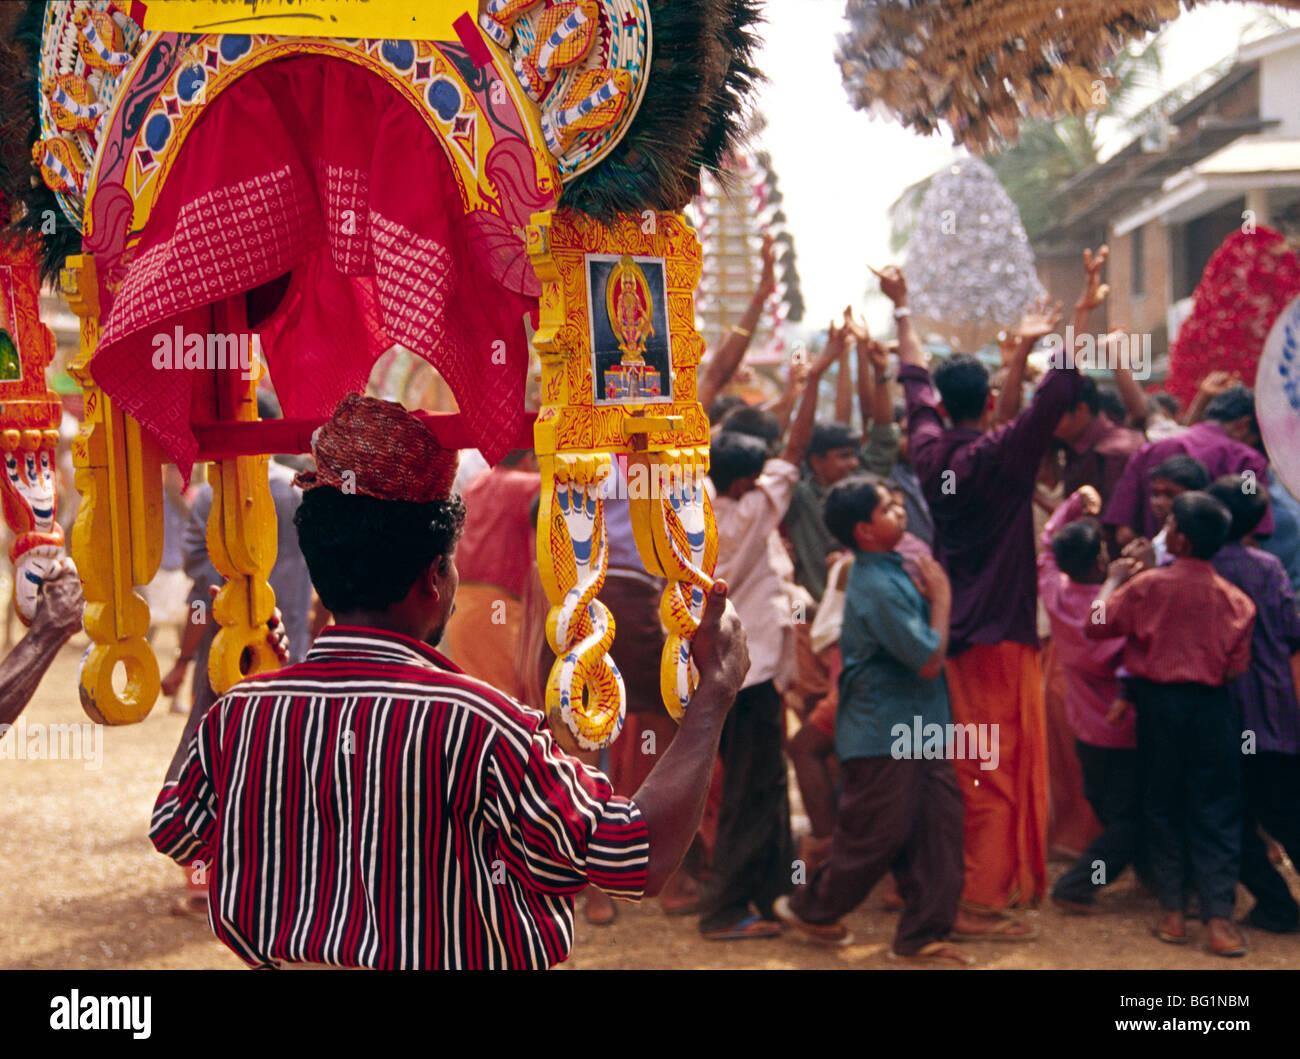 Kavady India Stock Photos & Kavady India Stock Images - Alamy